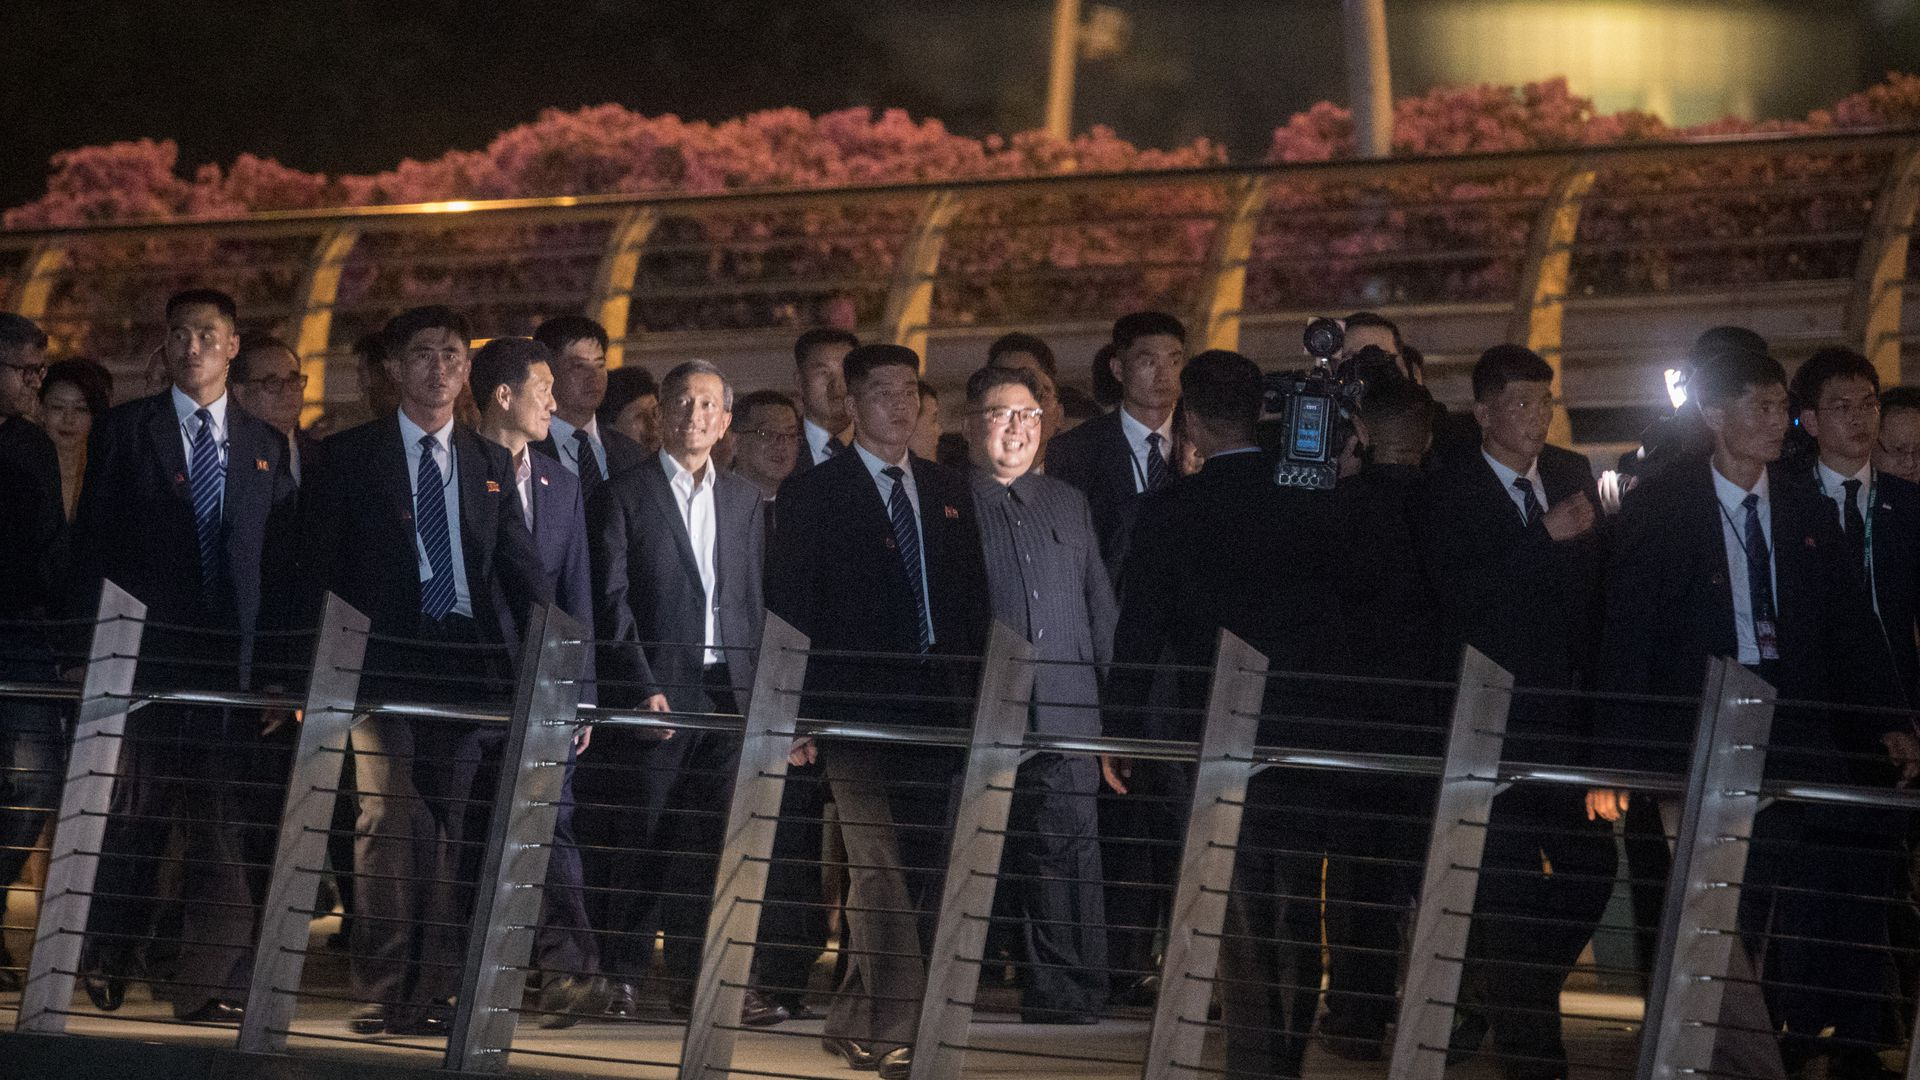 North Korean leader Kim Jong-un walking with bodyguards